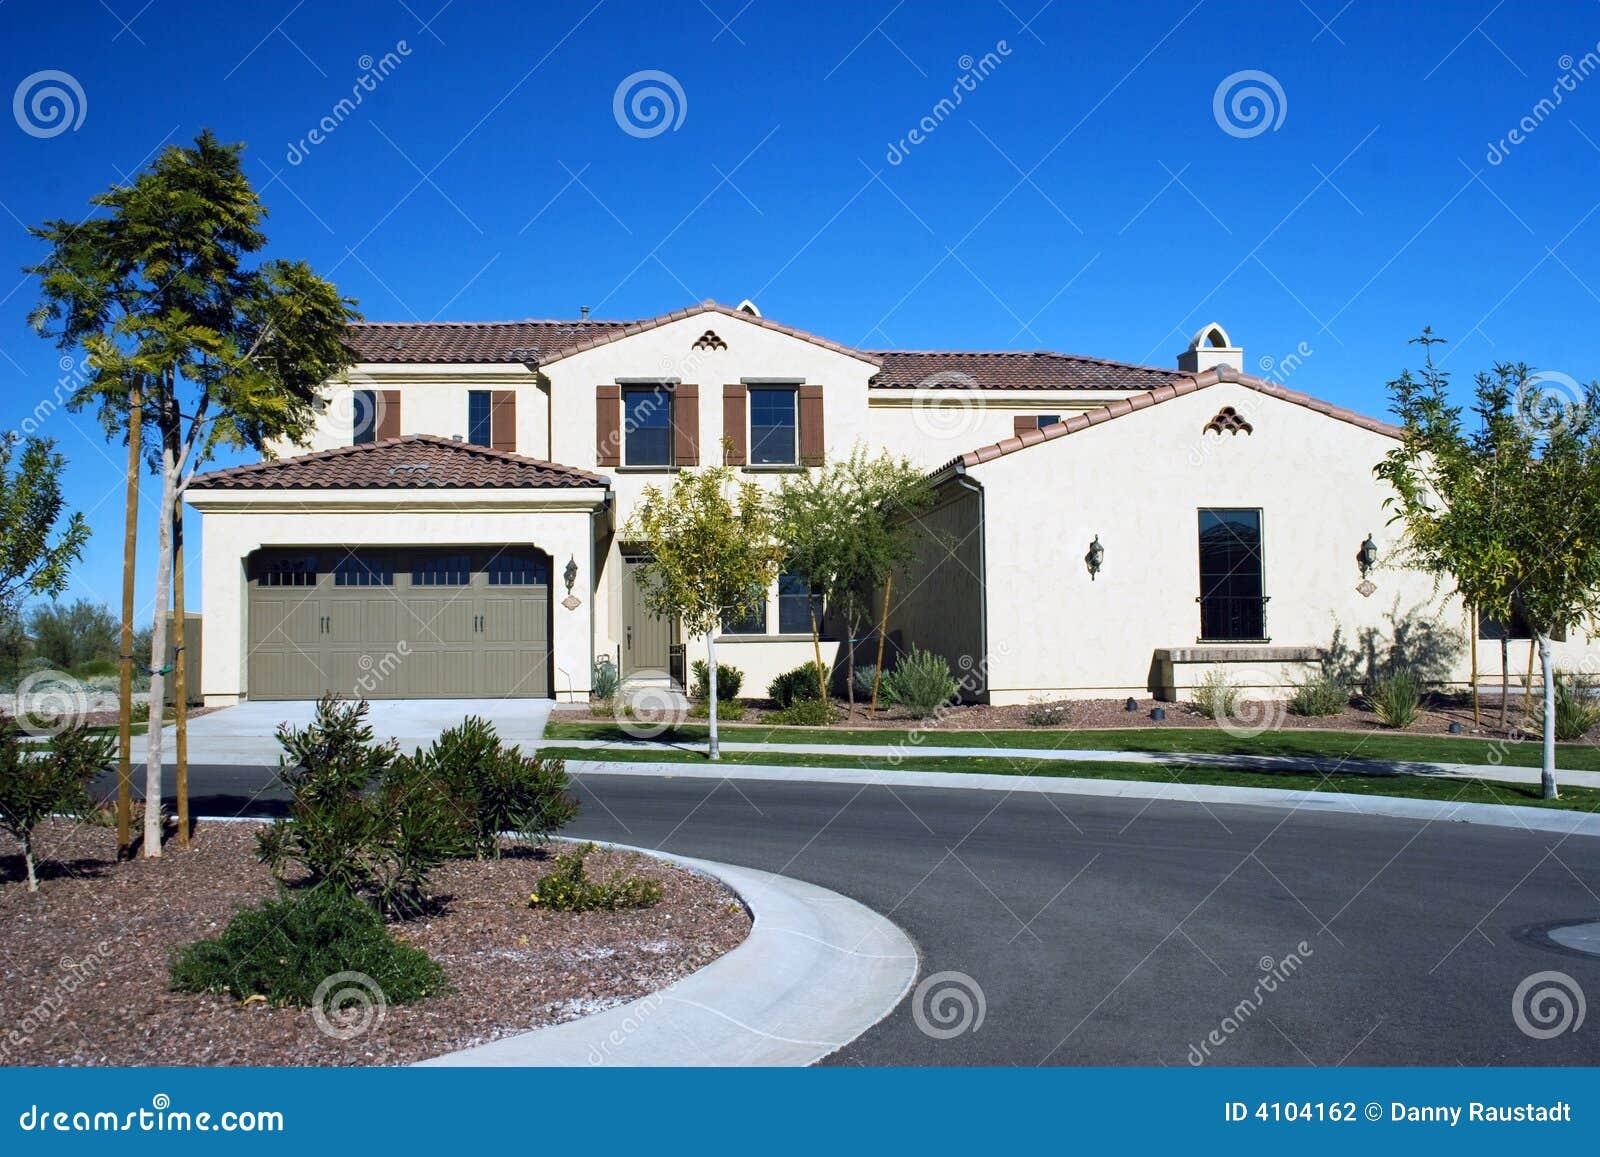 Modern home in the desert stock photography image 4104162 for Modern homes arizona